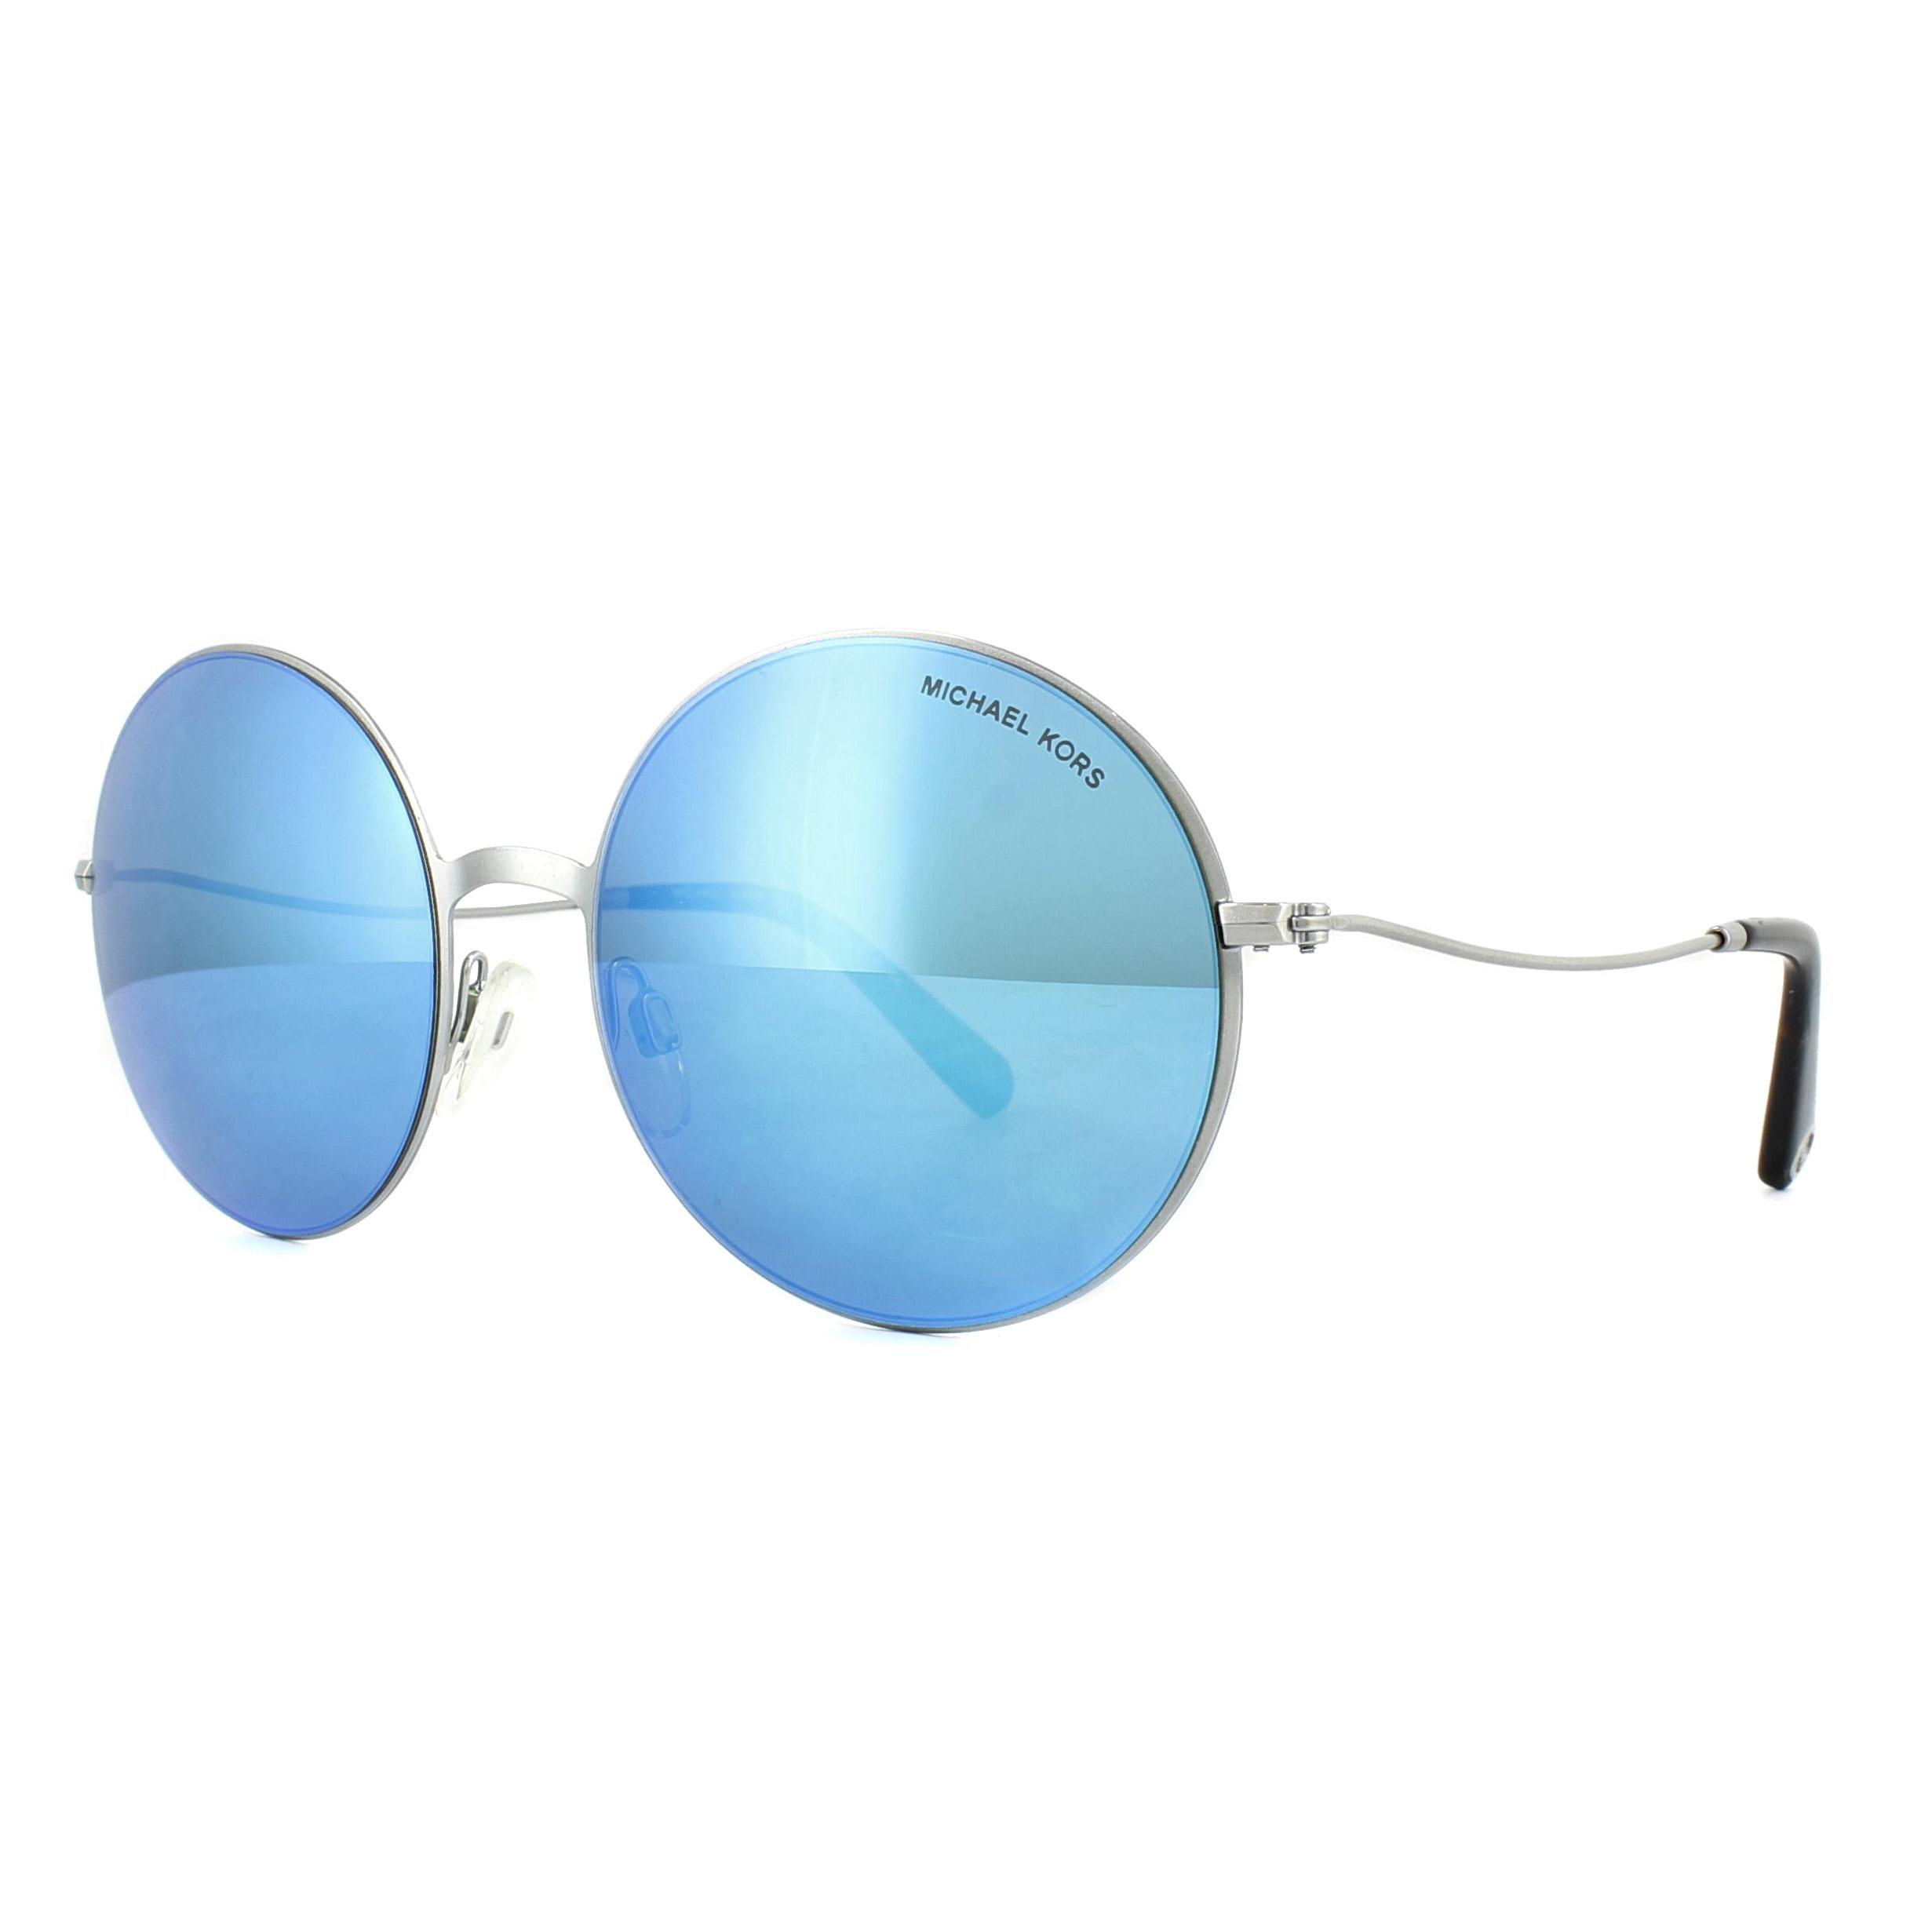 2afeada7cbcf0 Sentinel Michael Kors Sunglasses Kendall II 5017 100125 Silver Teal Mirror